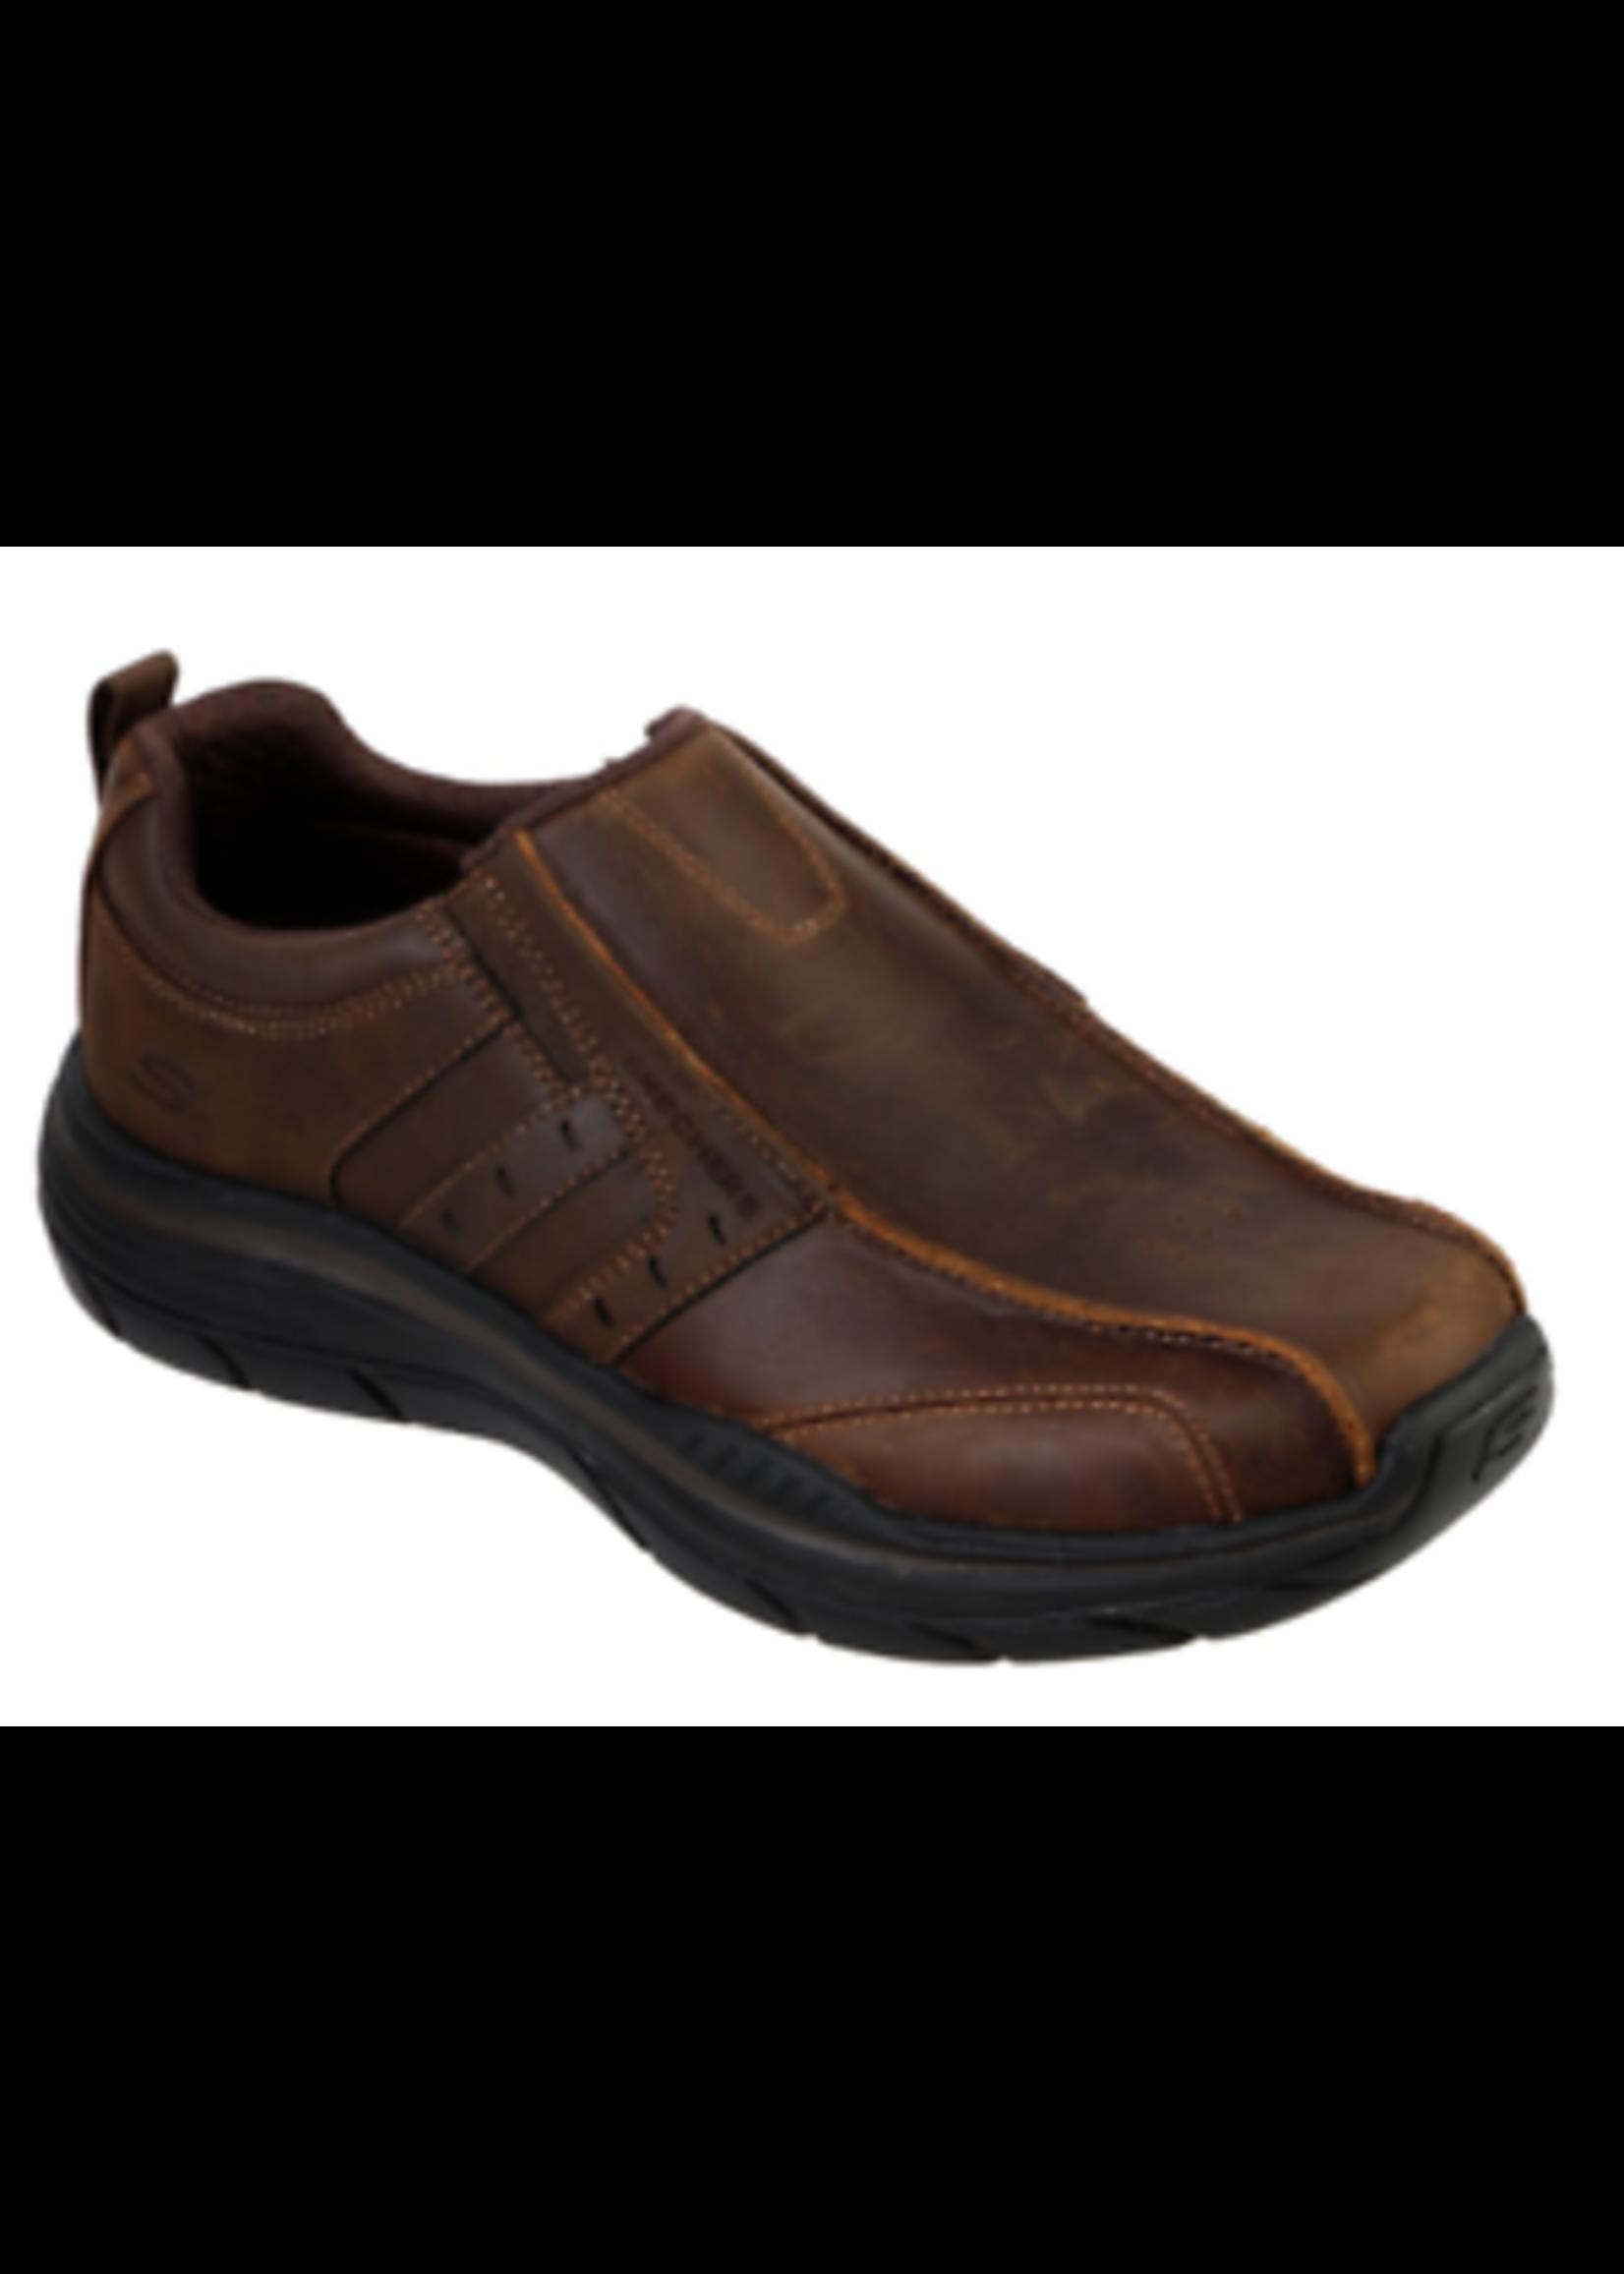 Skechers EXPECTED 2.0 - WILDON 66417